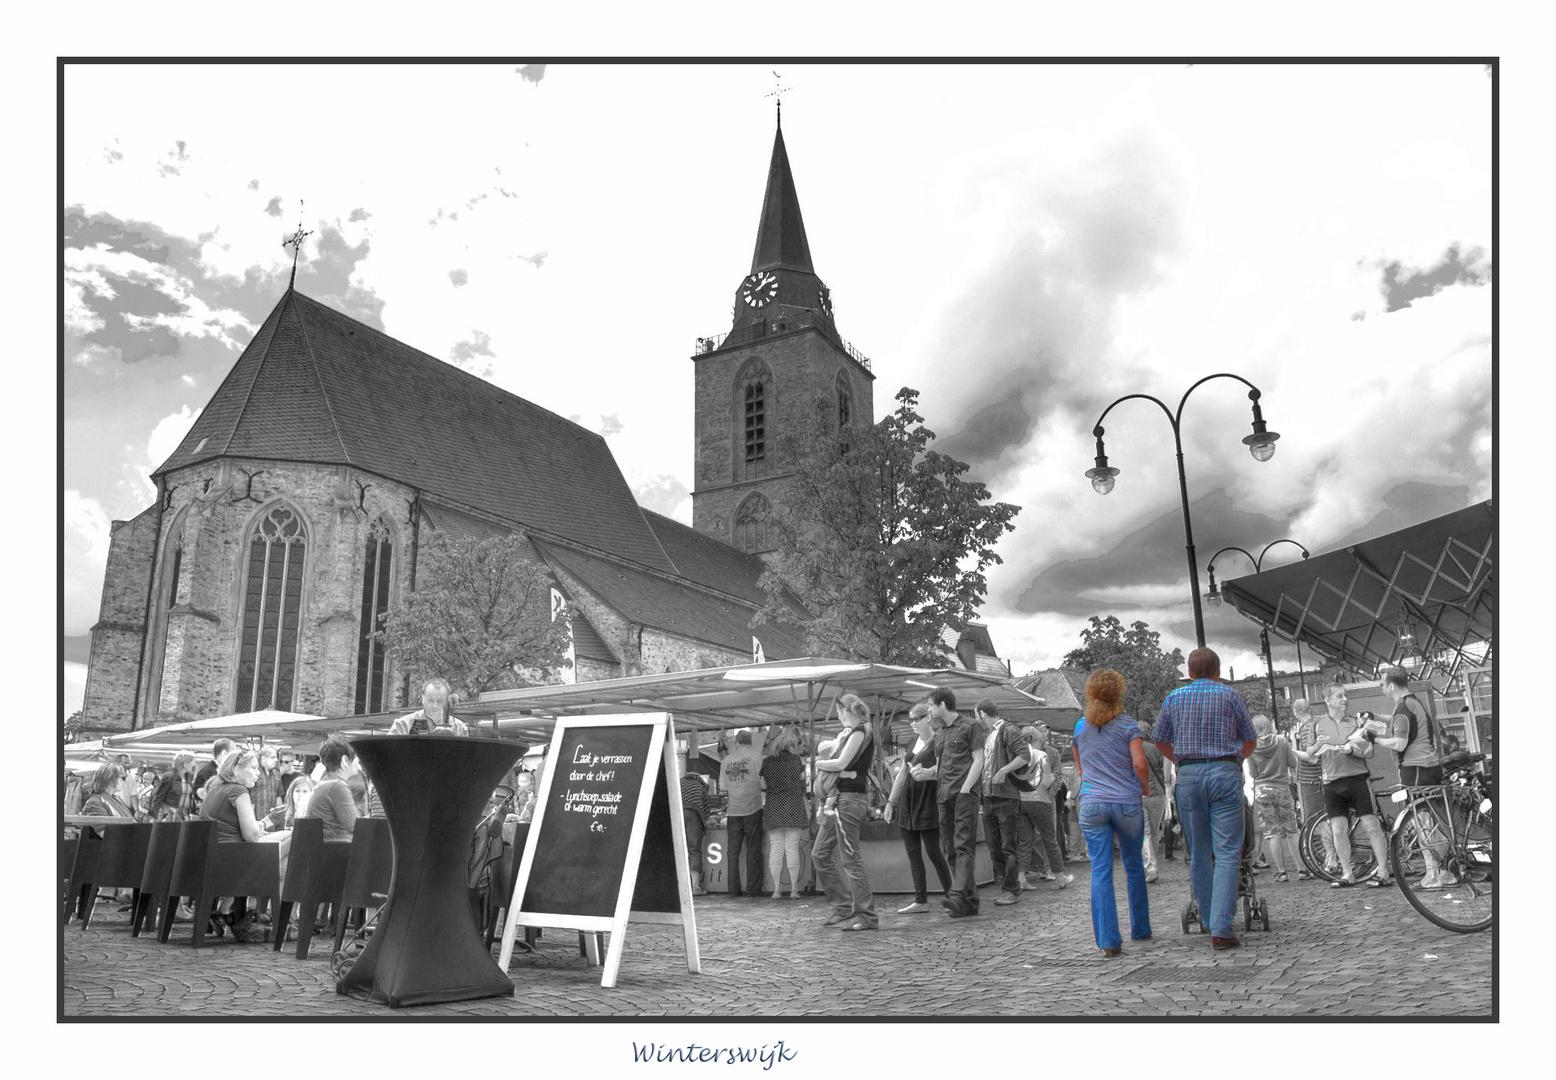 Winterswijk , HDR , Marktplatz ,Kirchhof ,